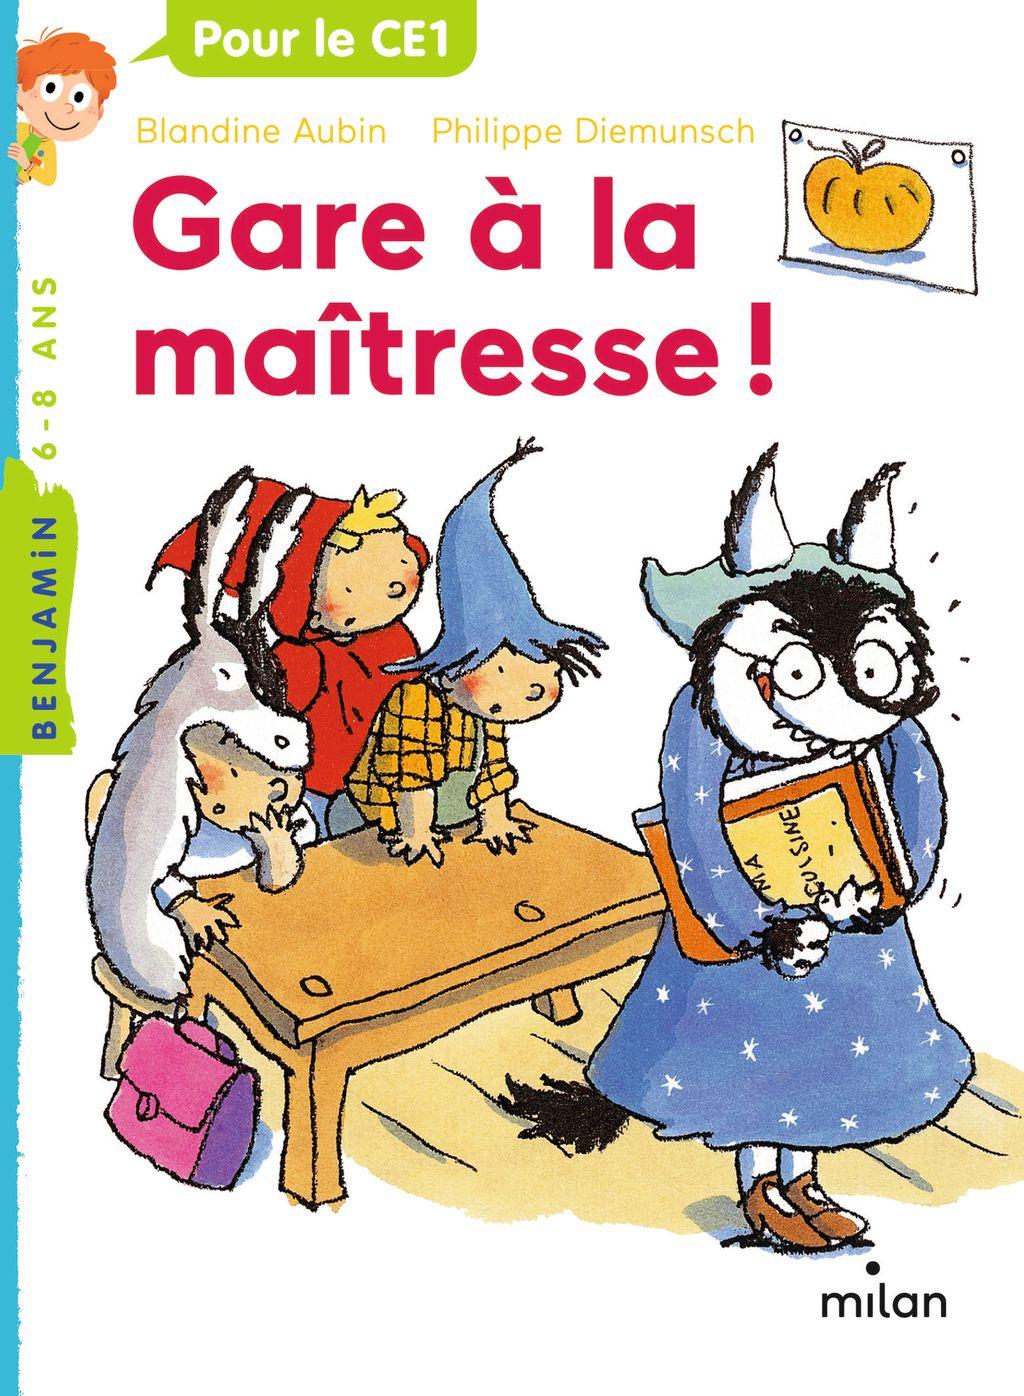 «Gare à la maîtresse» cover